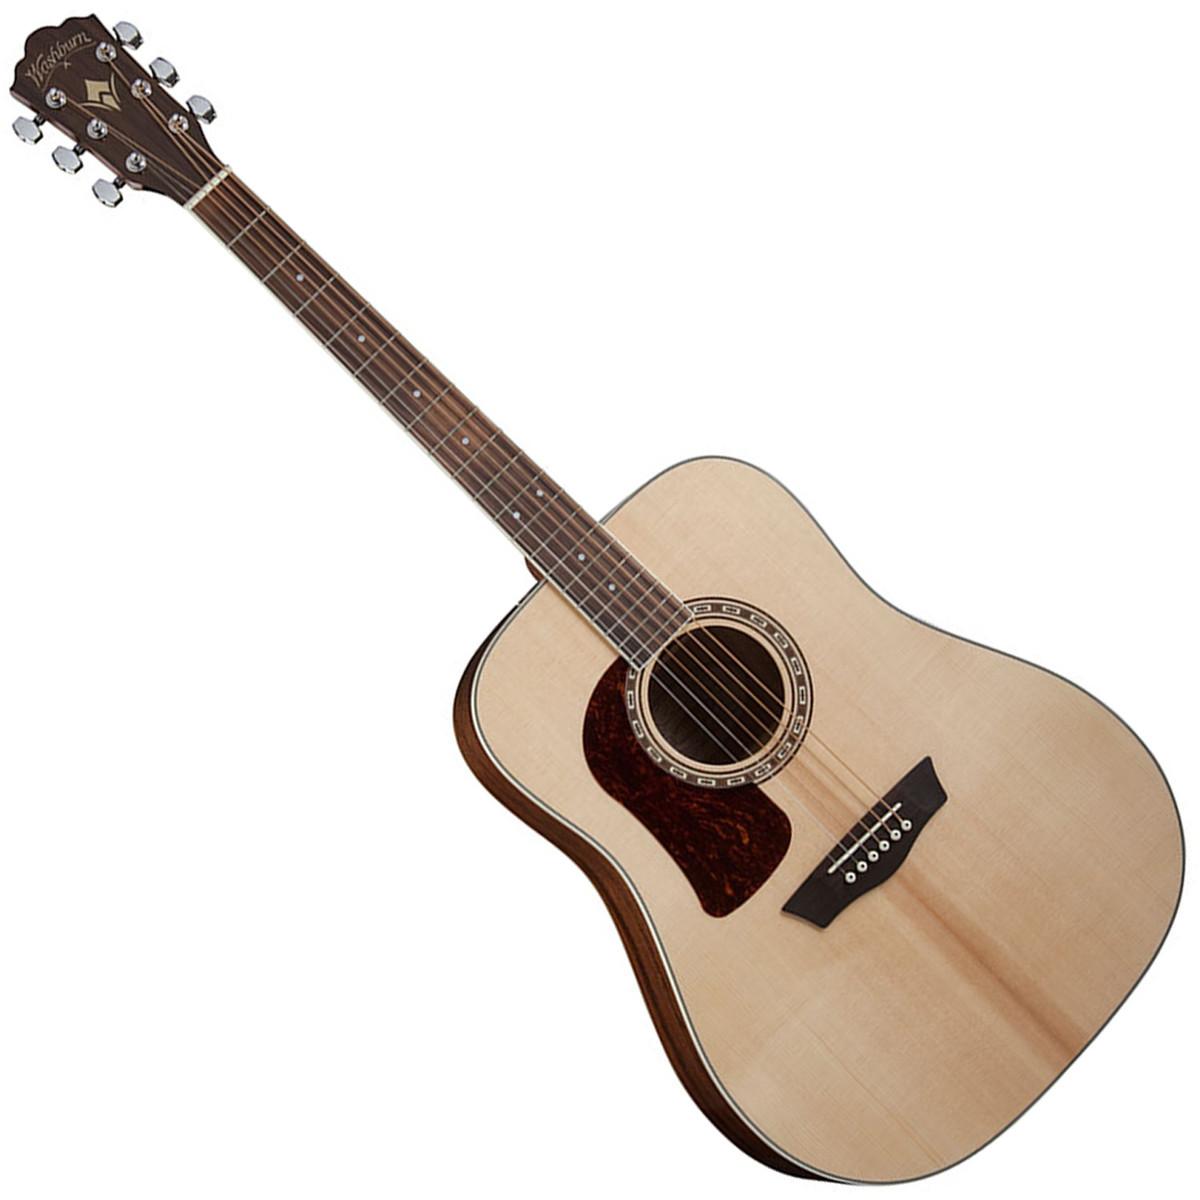 washburn hd10slh left handed dreadnought acoustic guitar at. Black Bedroom Furniture Sets. Home Design Ideas